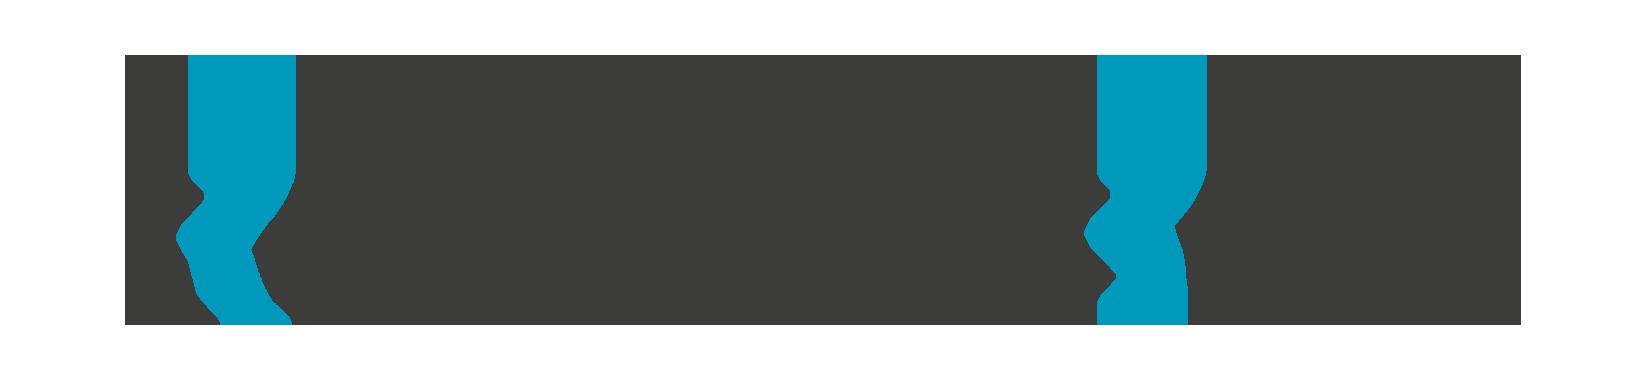 RomainBosc_logo 01b